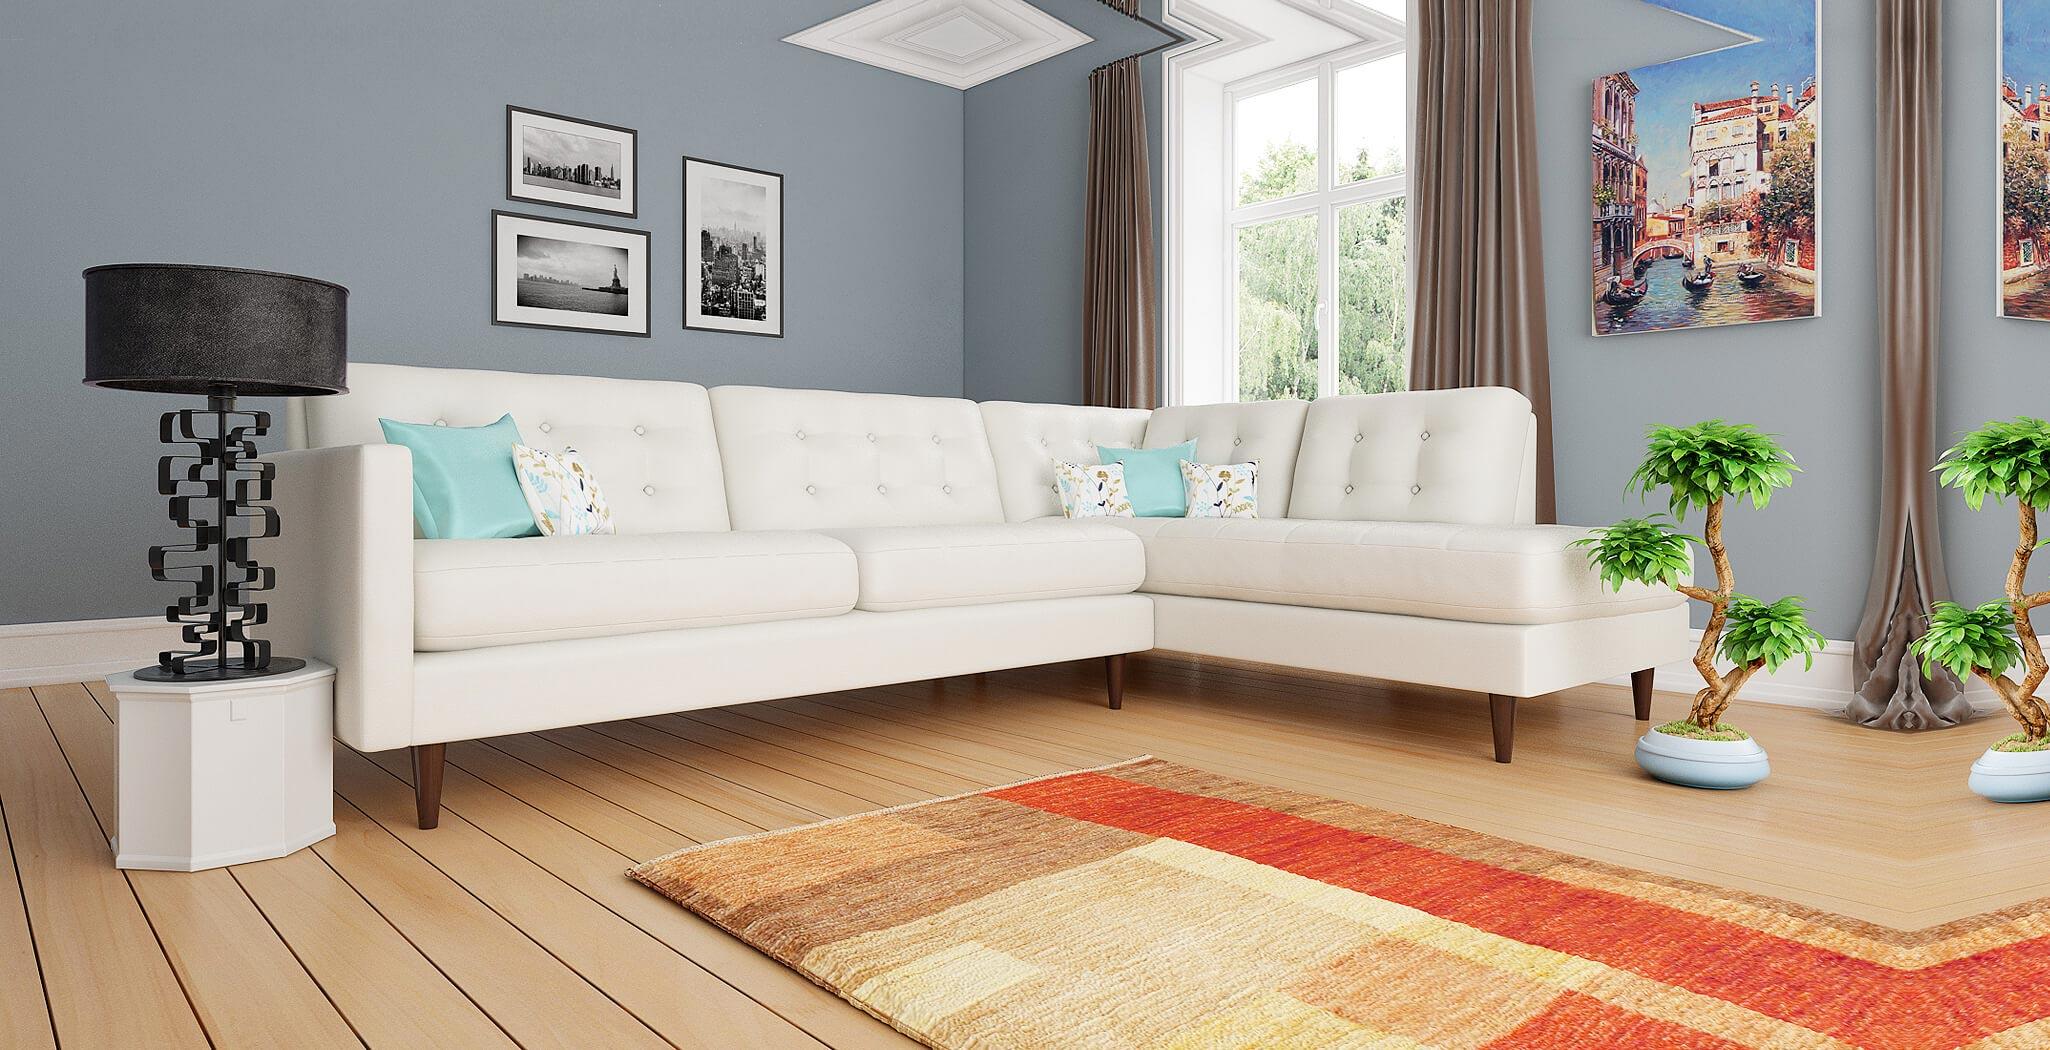 oslo panel furniture gallery 4